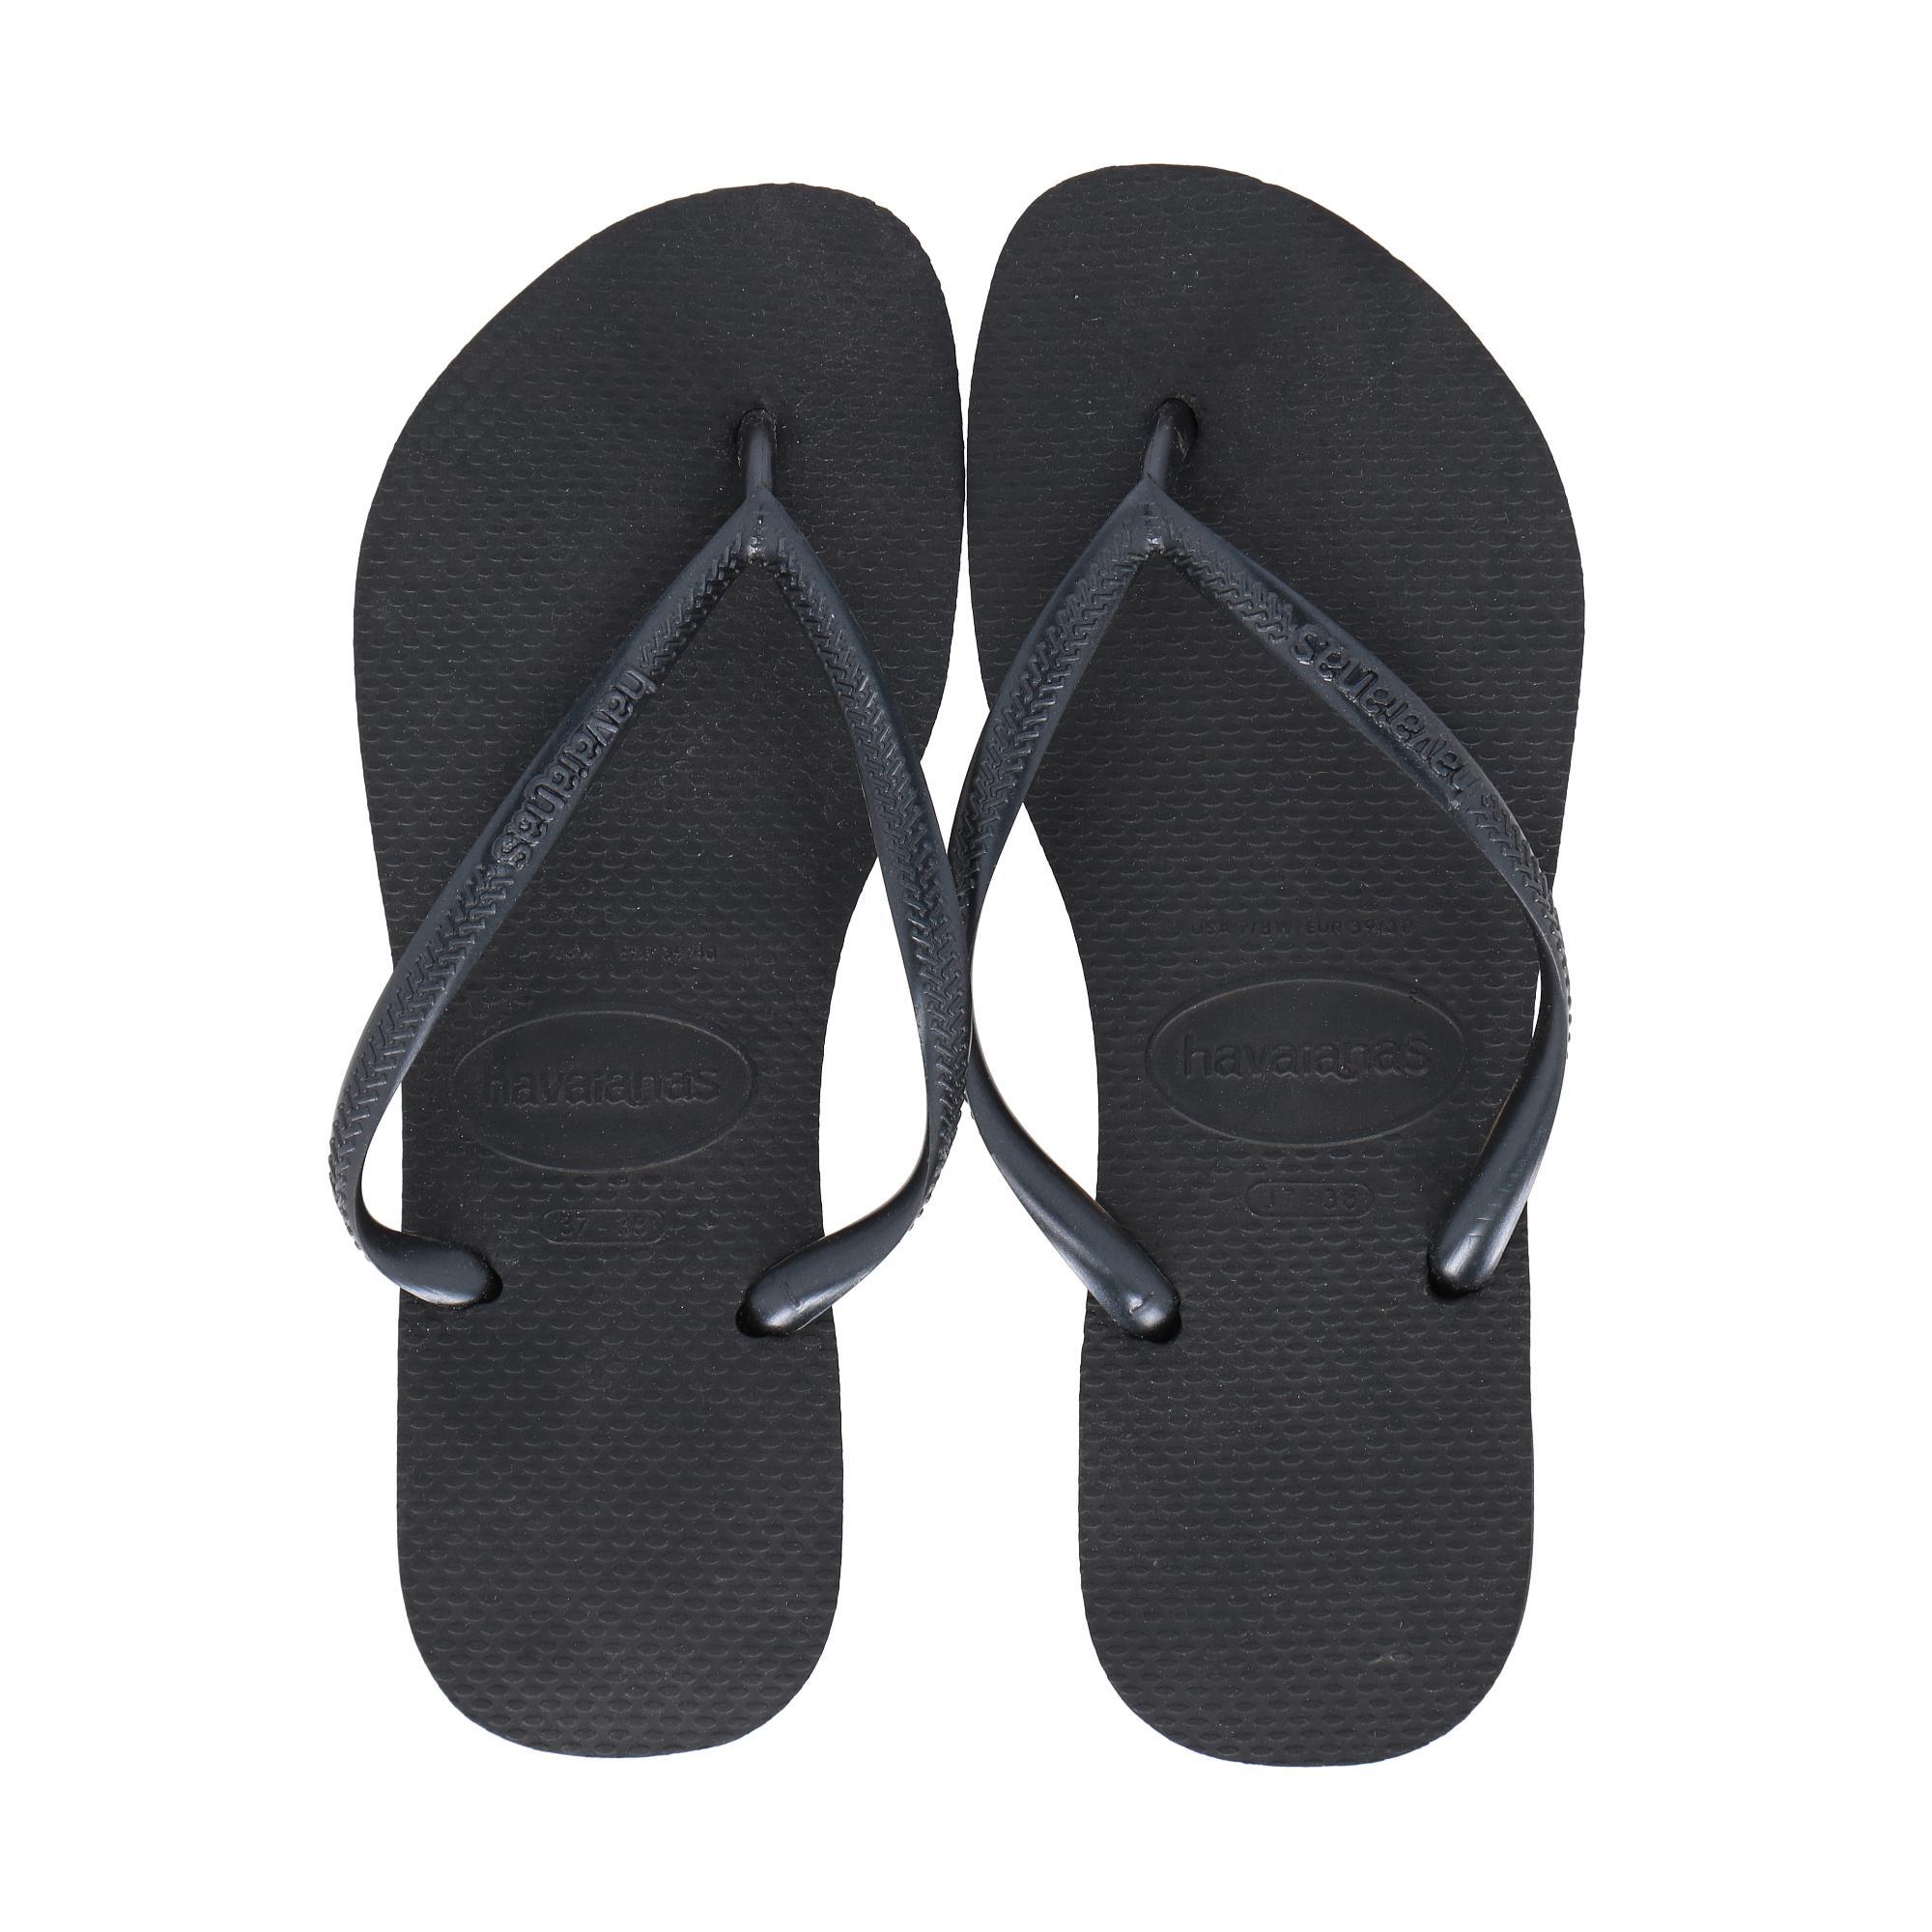 7b7a4c76a3a8 WOMAN FLIP-FLOPS. Havaianas Slim Black